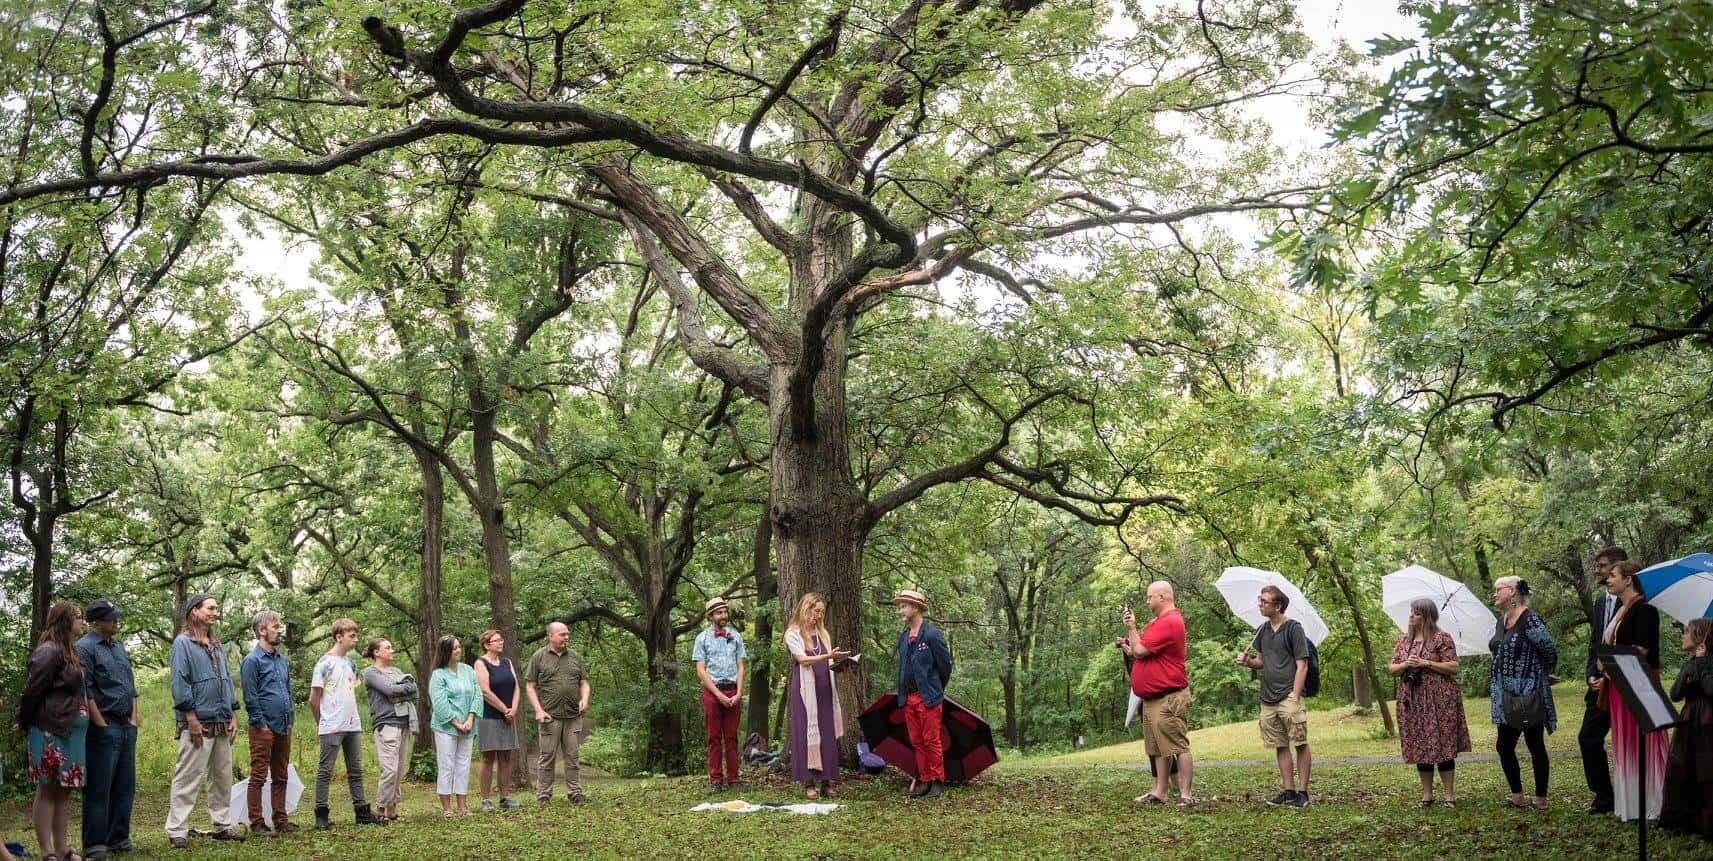 Our wedding circle under an oak tree.